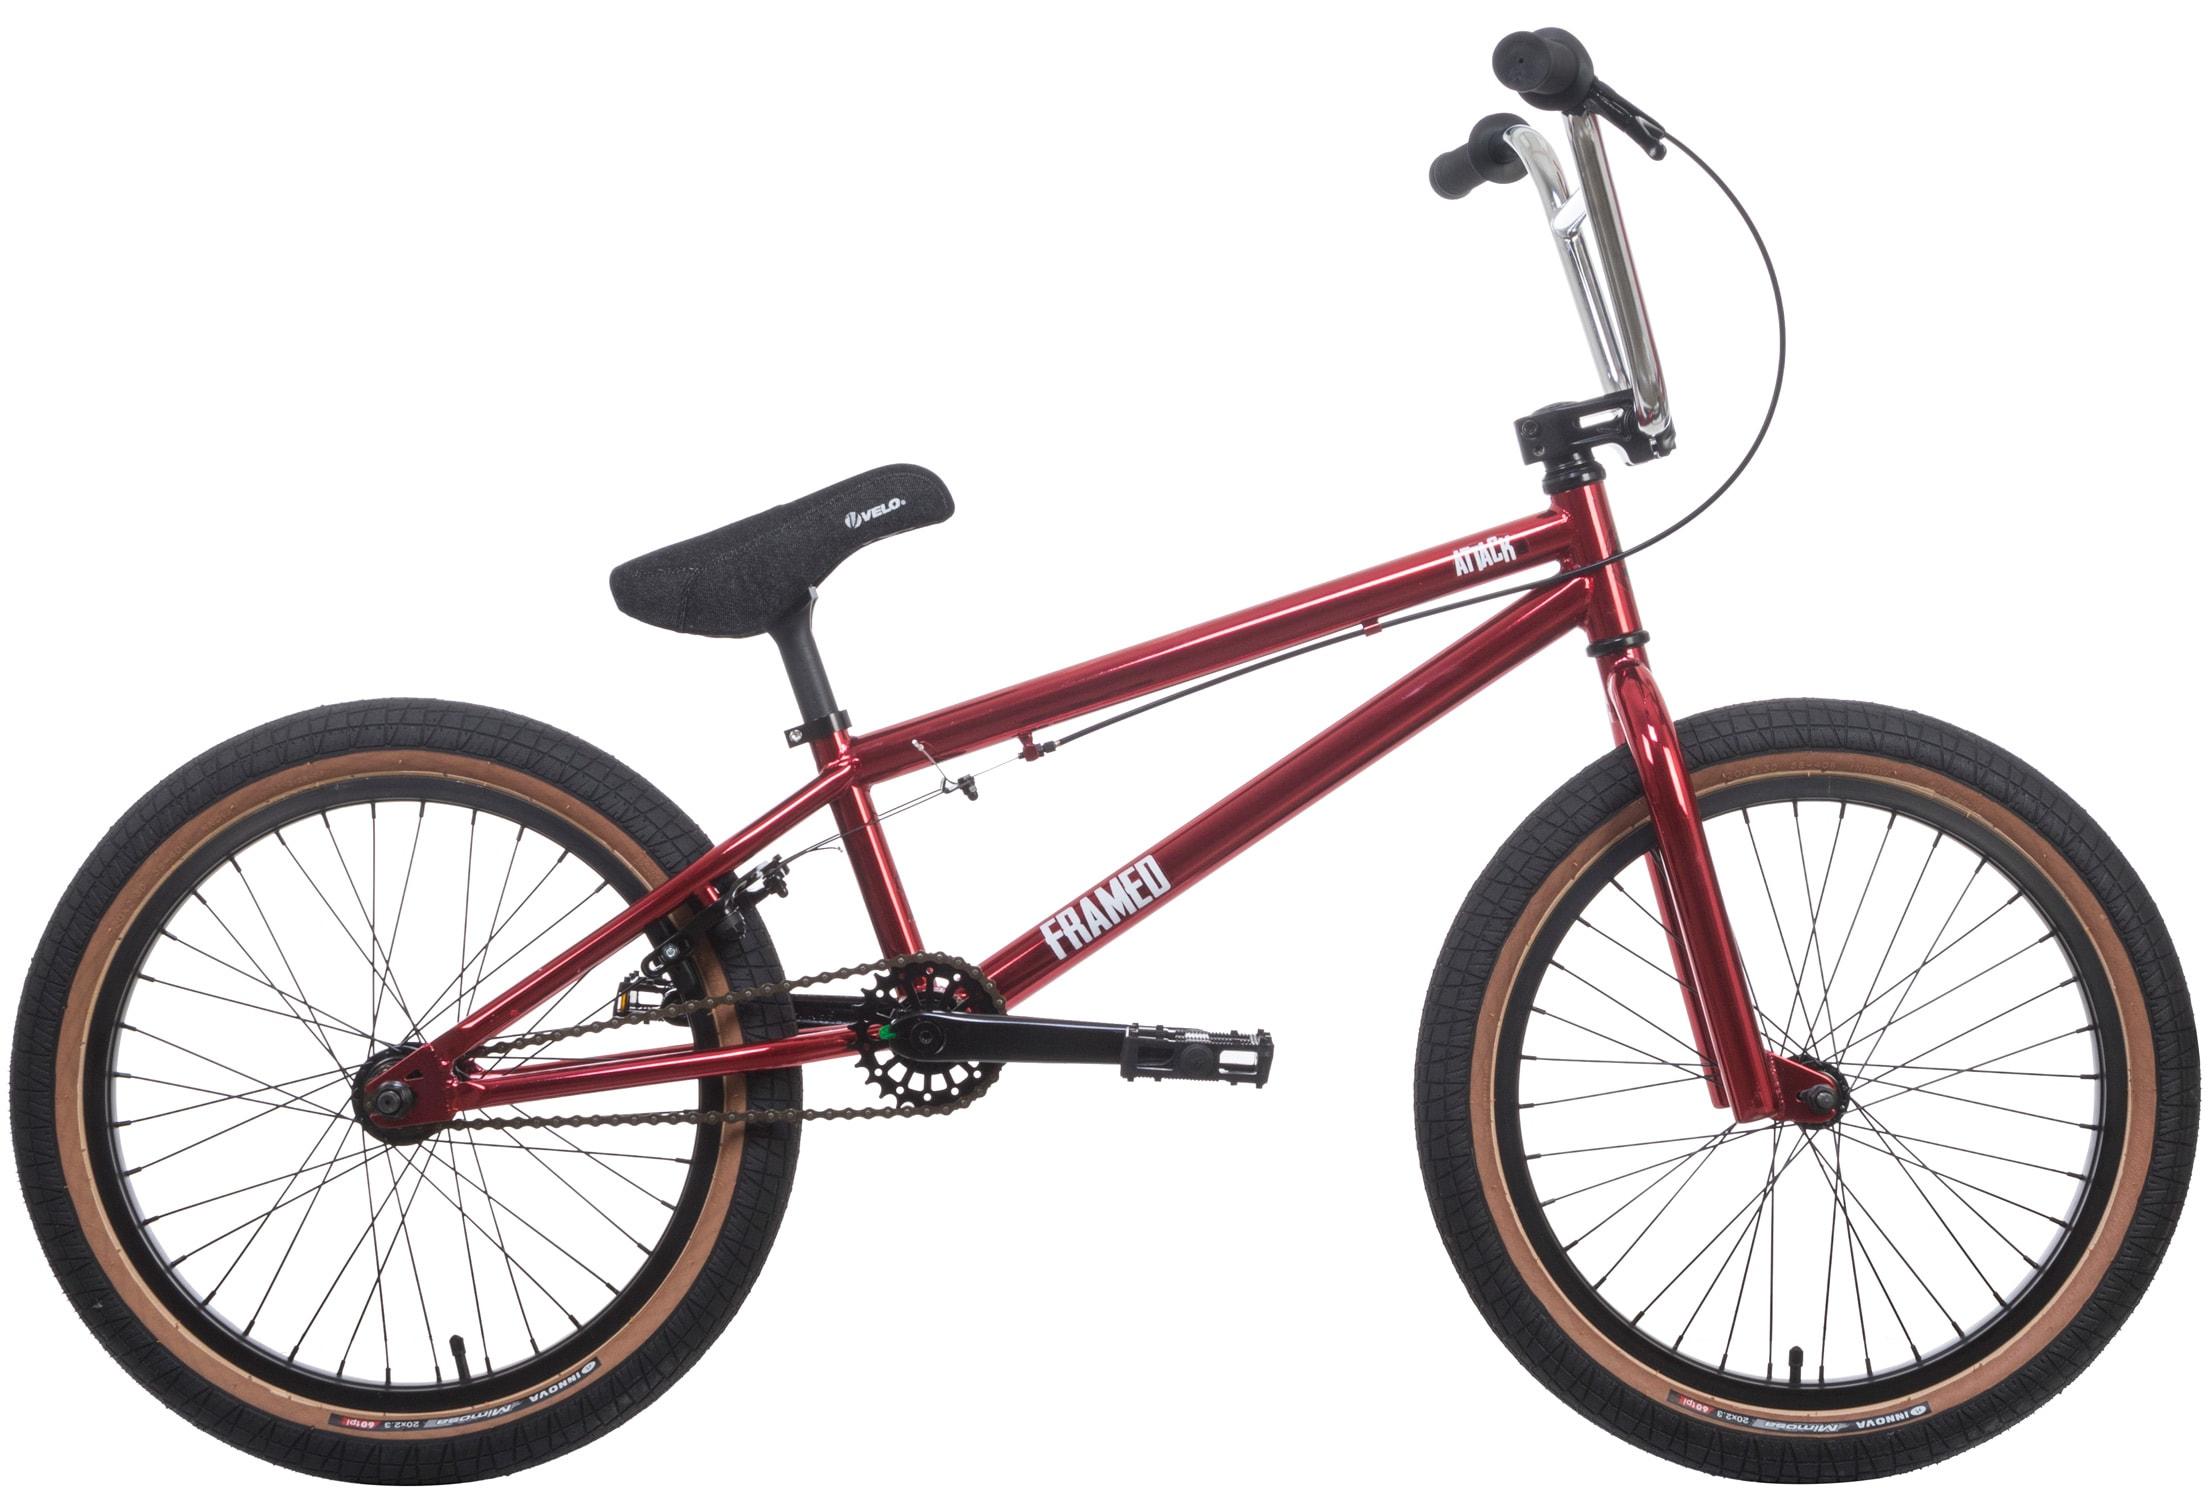 defdcaebf9 on sale framed attack pro bmx bike up to 40 off BMX Bike Shoes LEGO BMX Bike